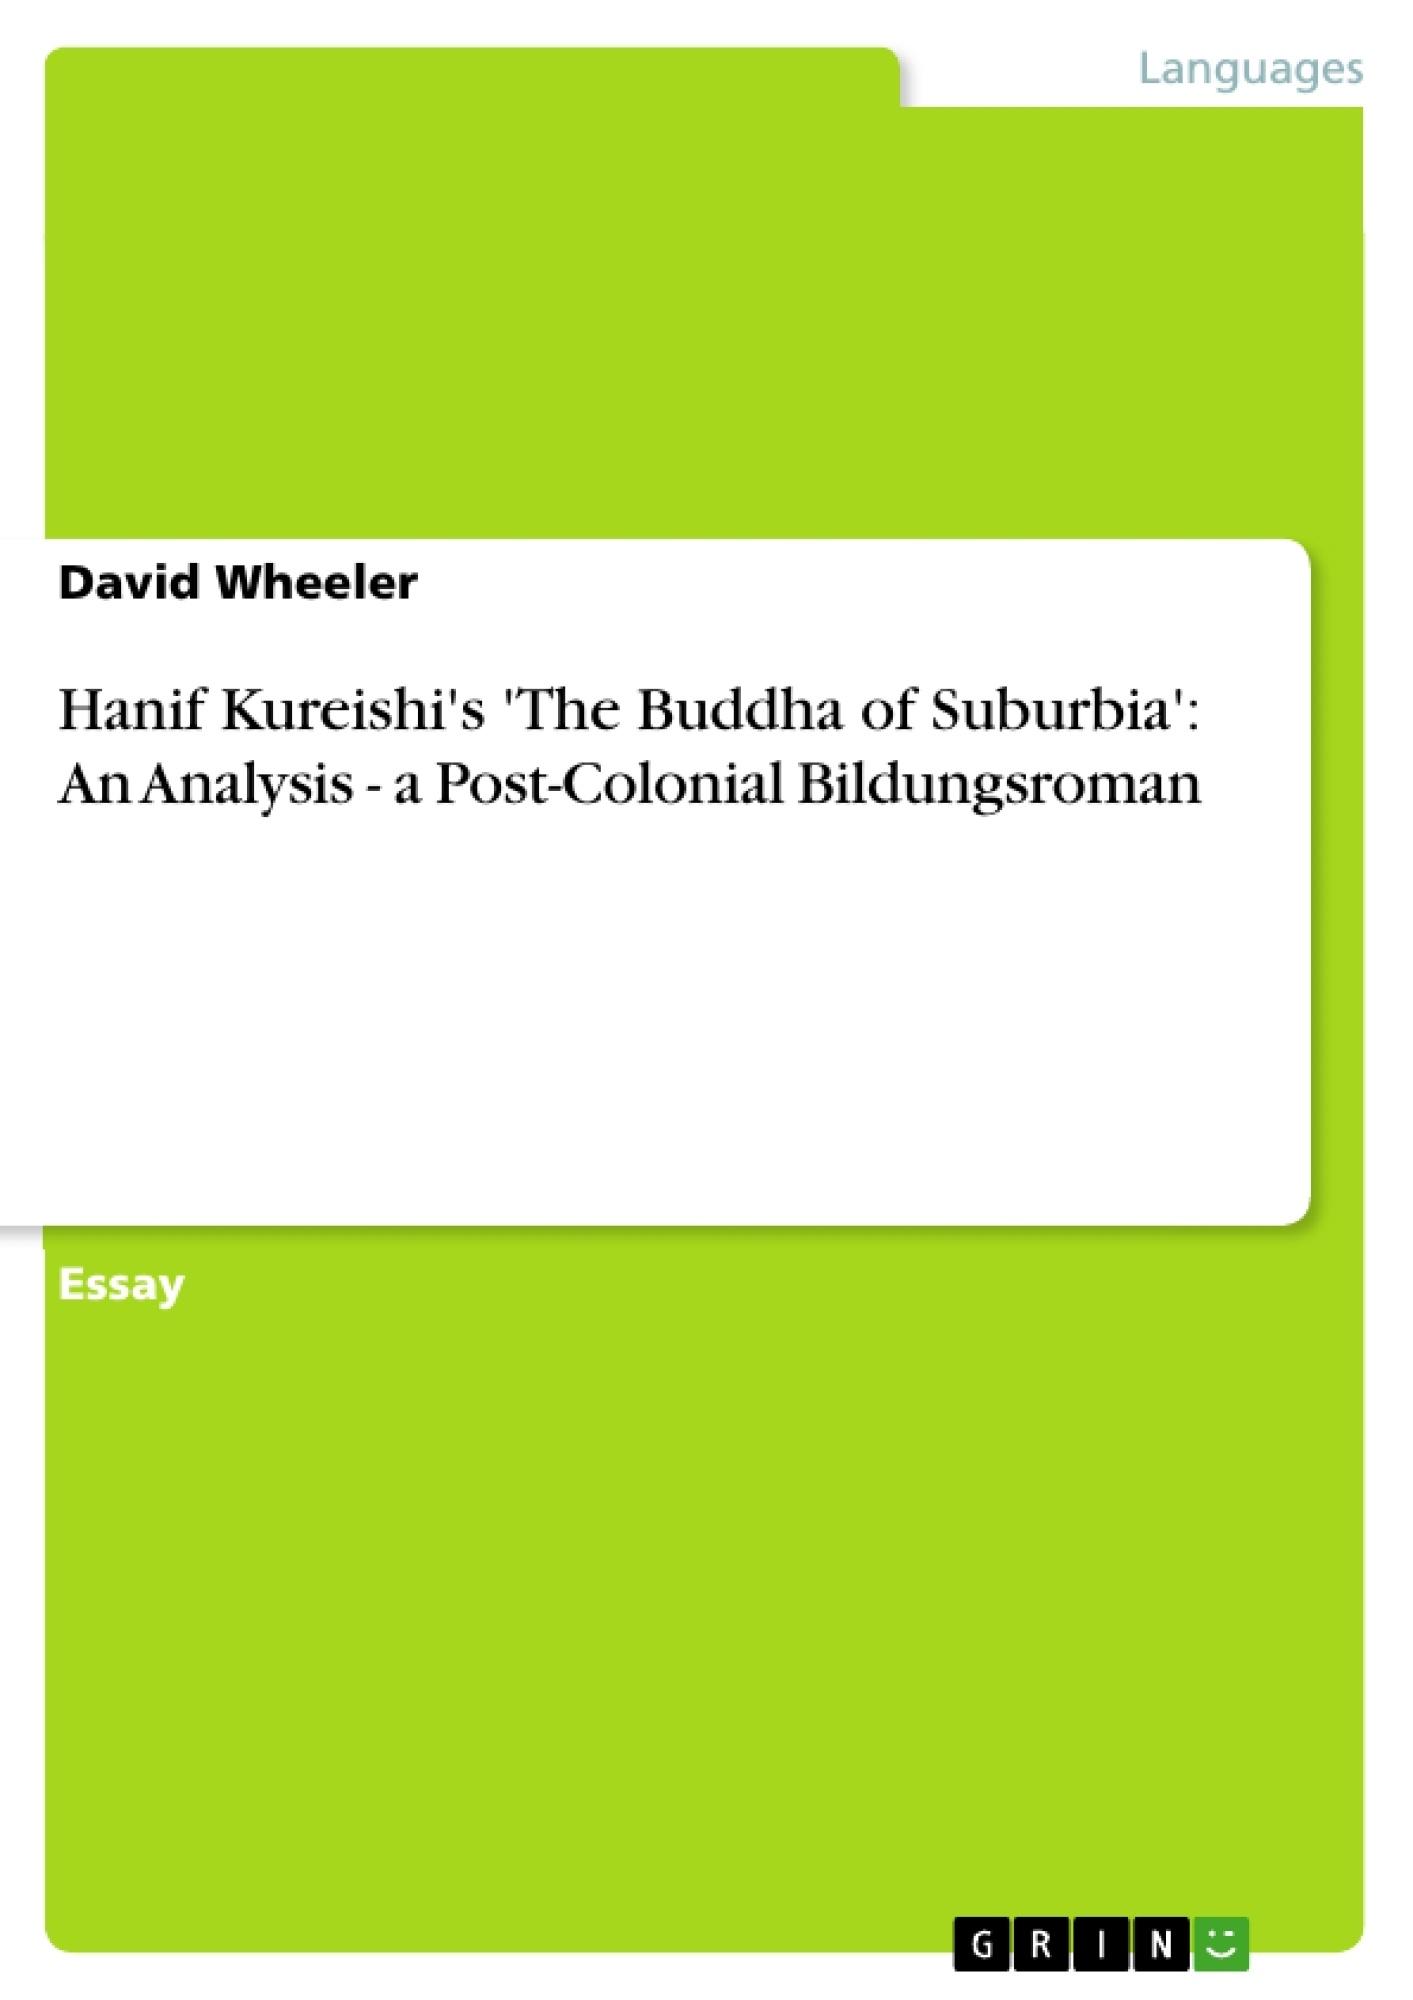 Title: Hanif Kureishi's 'The Buddha of Suburbia': An Analysis - a Post-Colonial Bildungsroman